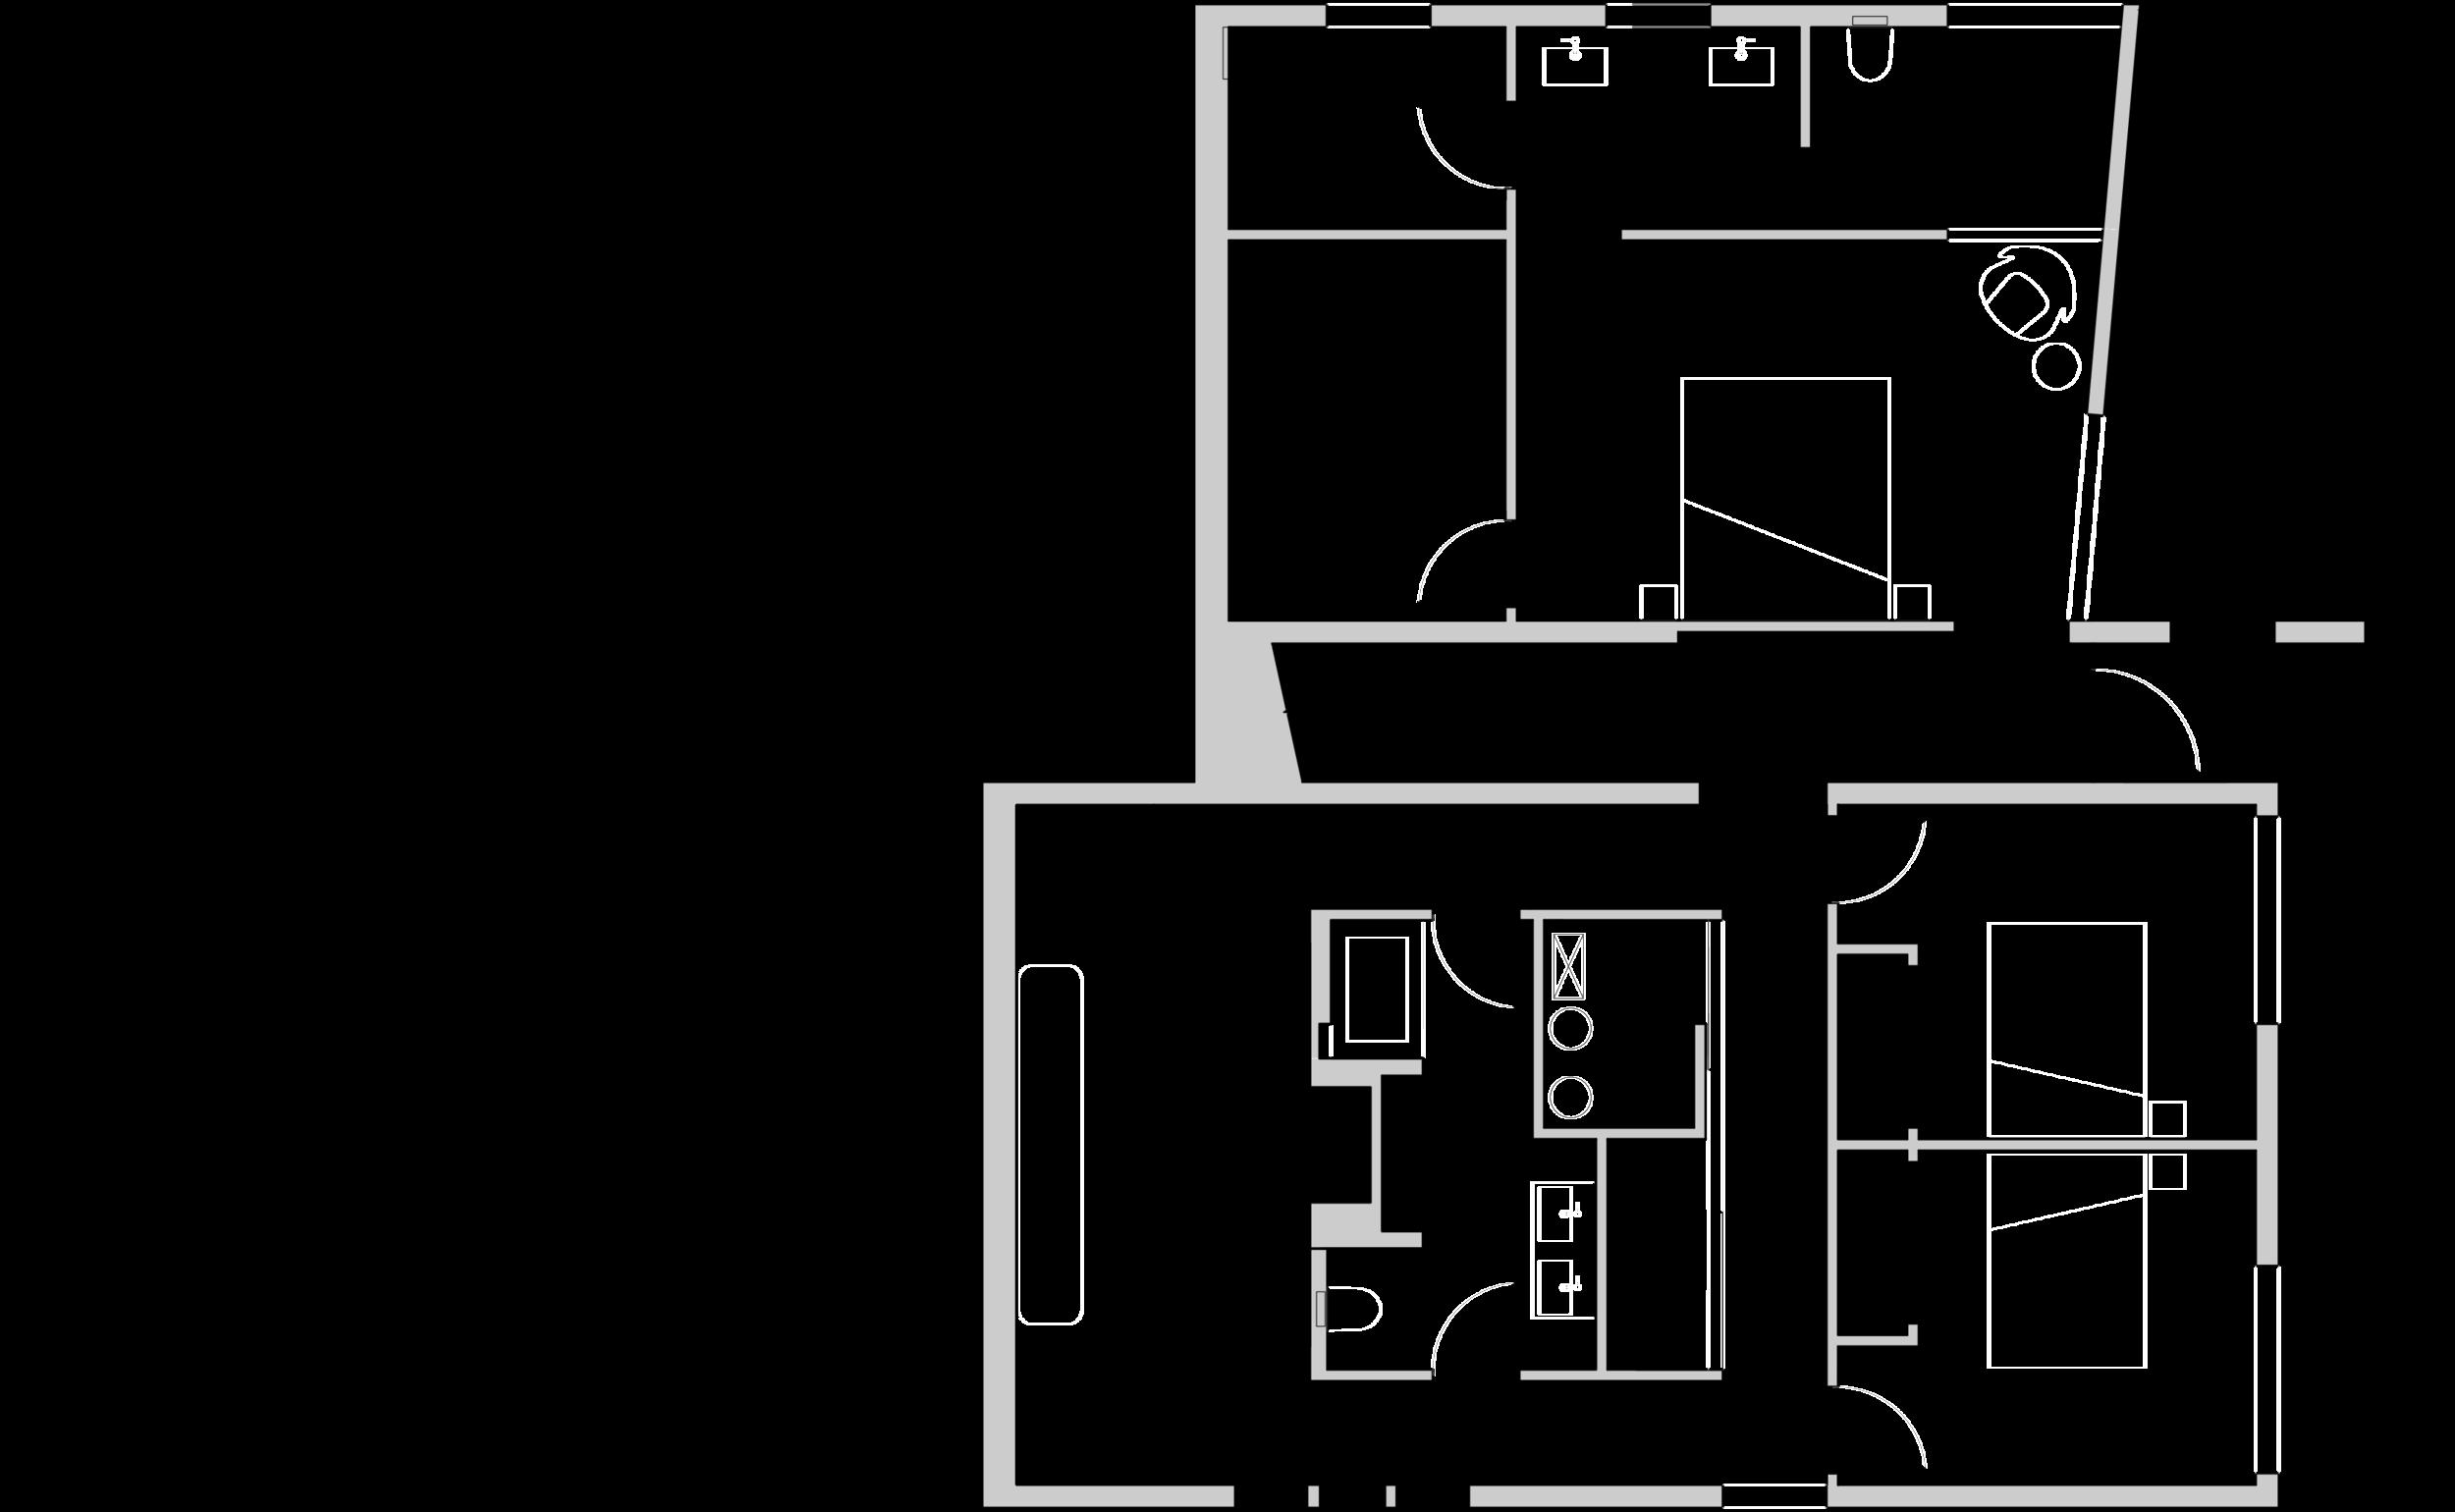 Lower Floor Plan_flattened.png